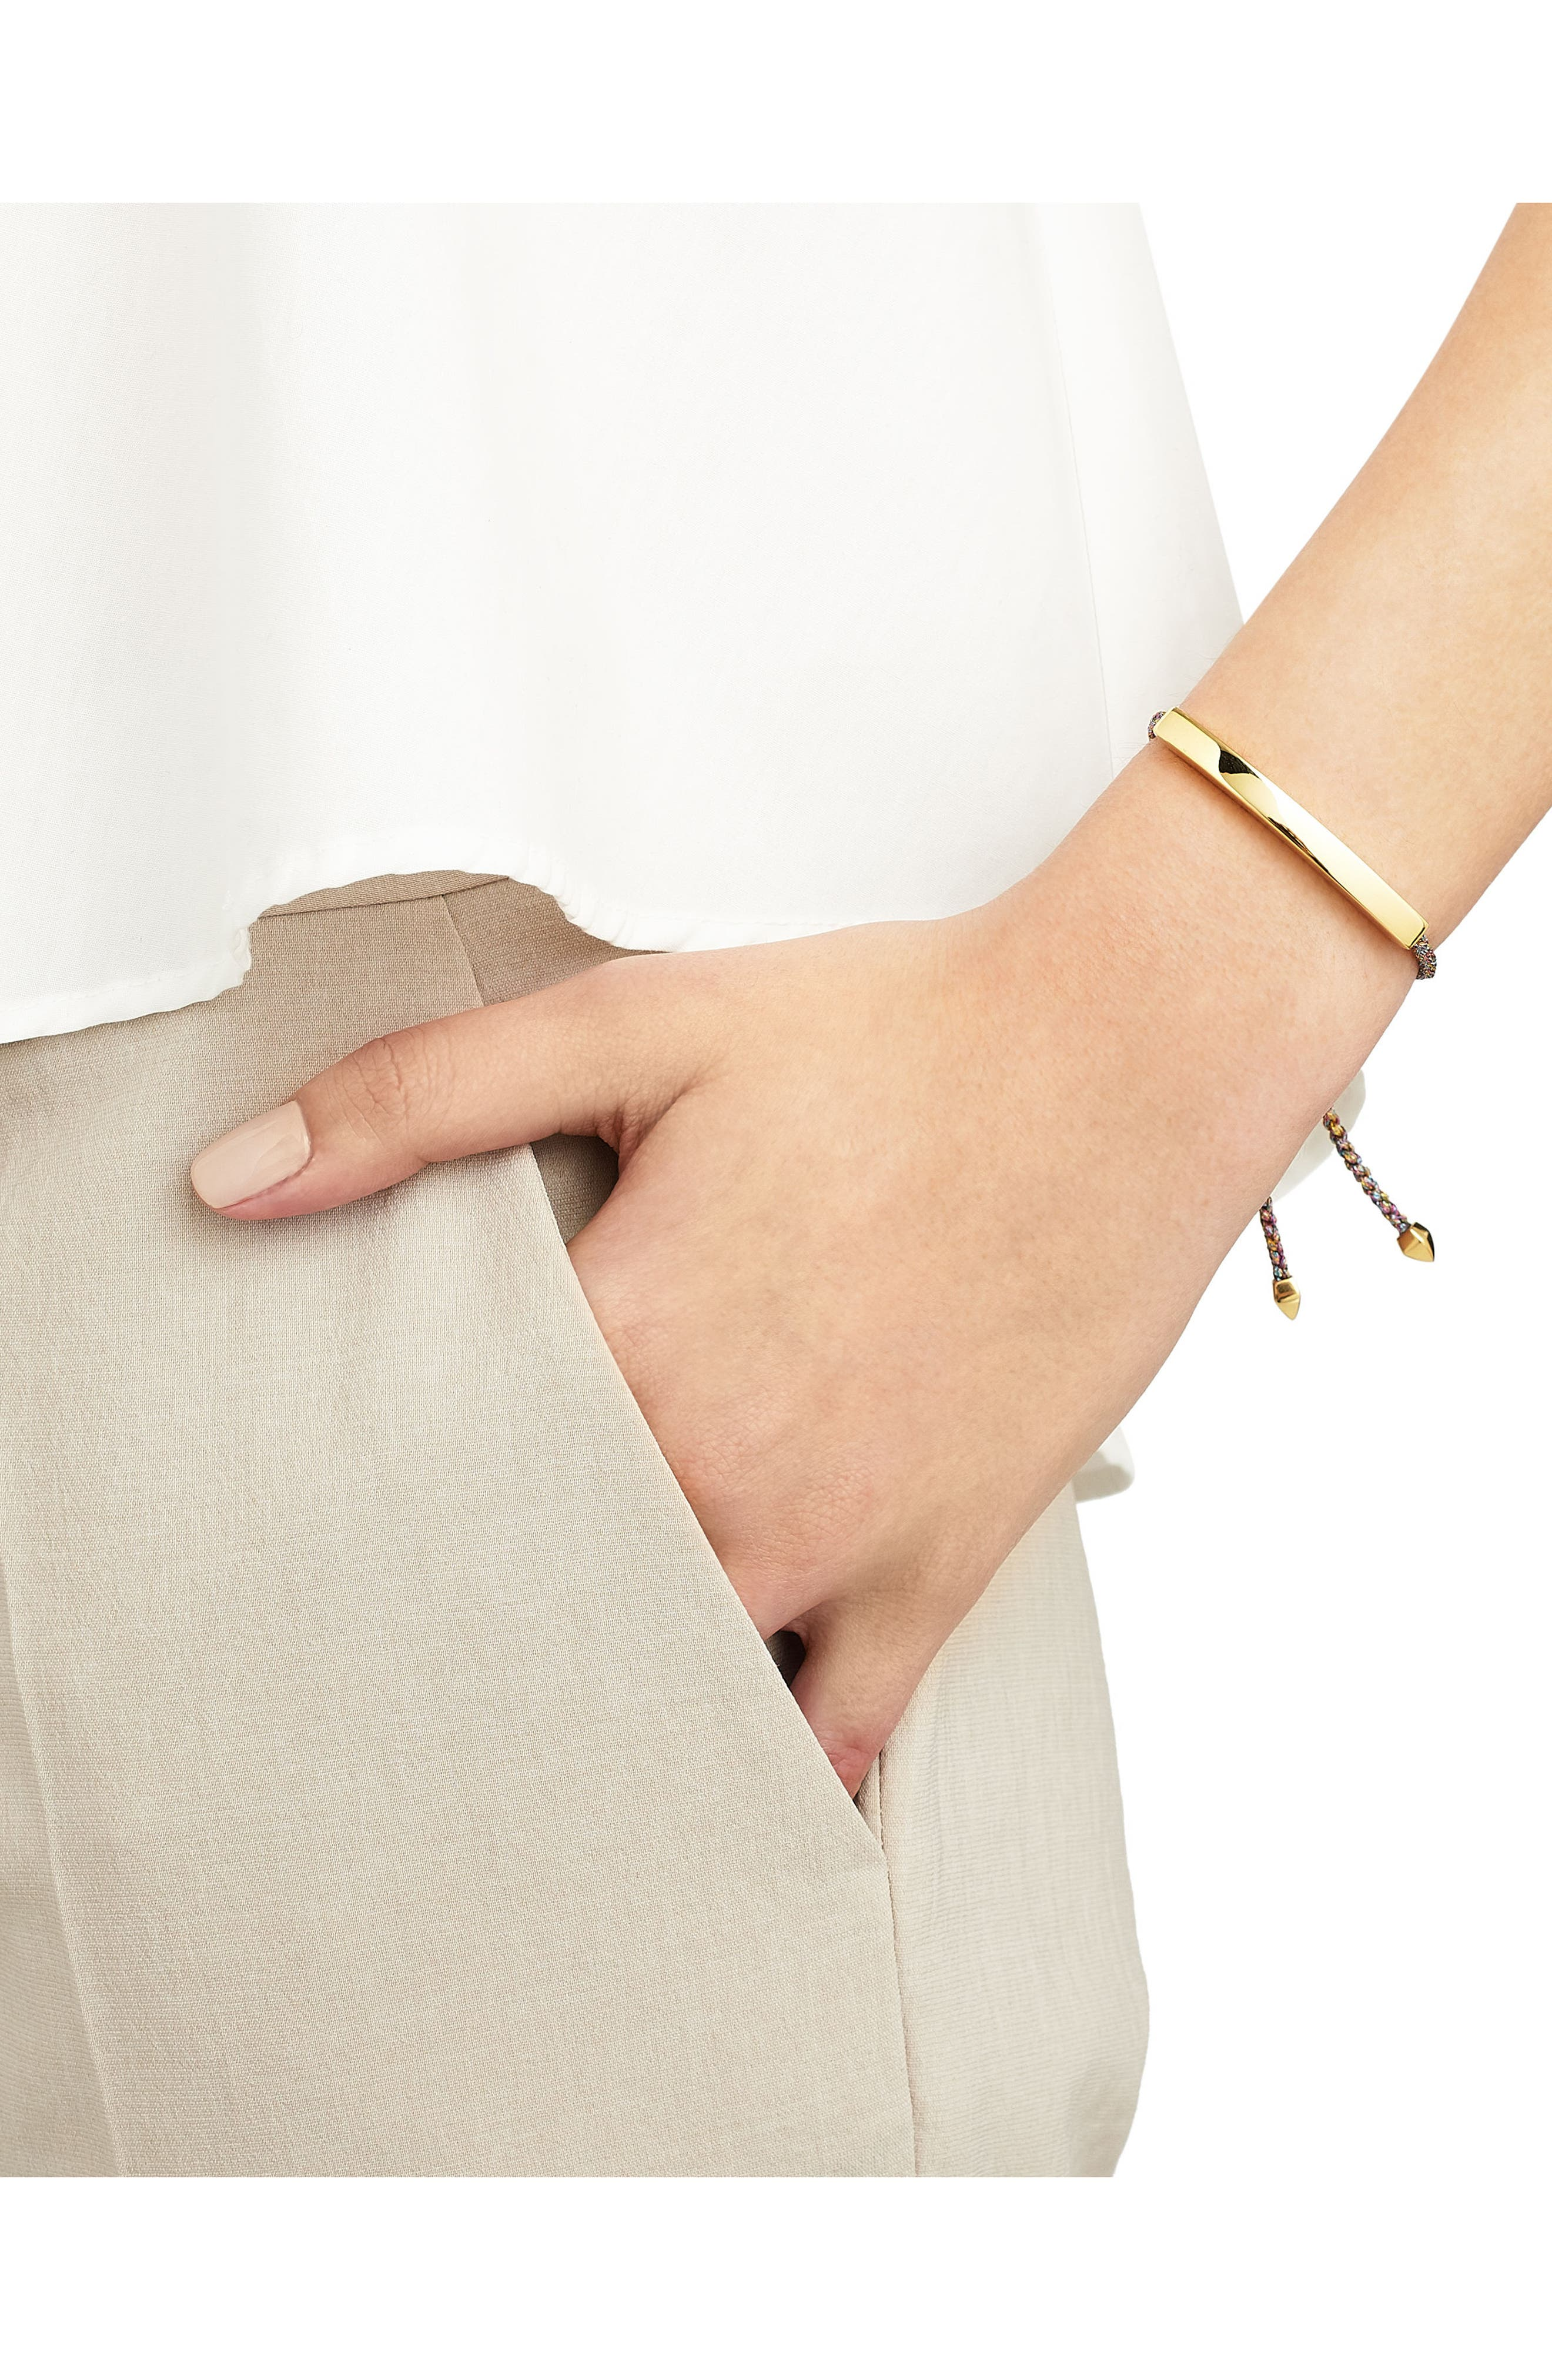 Engravable Large Linear Friendship Bracelet,                             Alternate thumbnail 2, color,                             RAINBOW METALLIC/ YELLOW GOLD